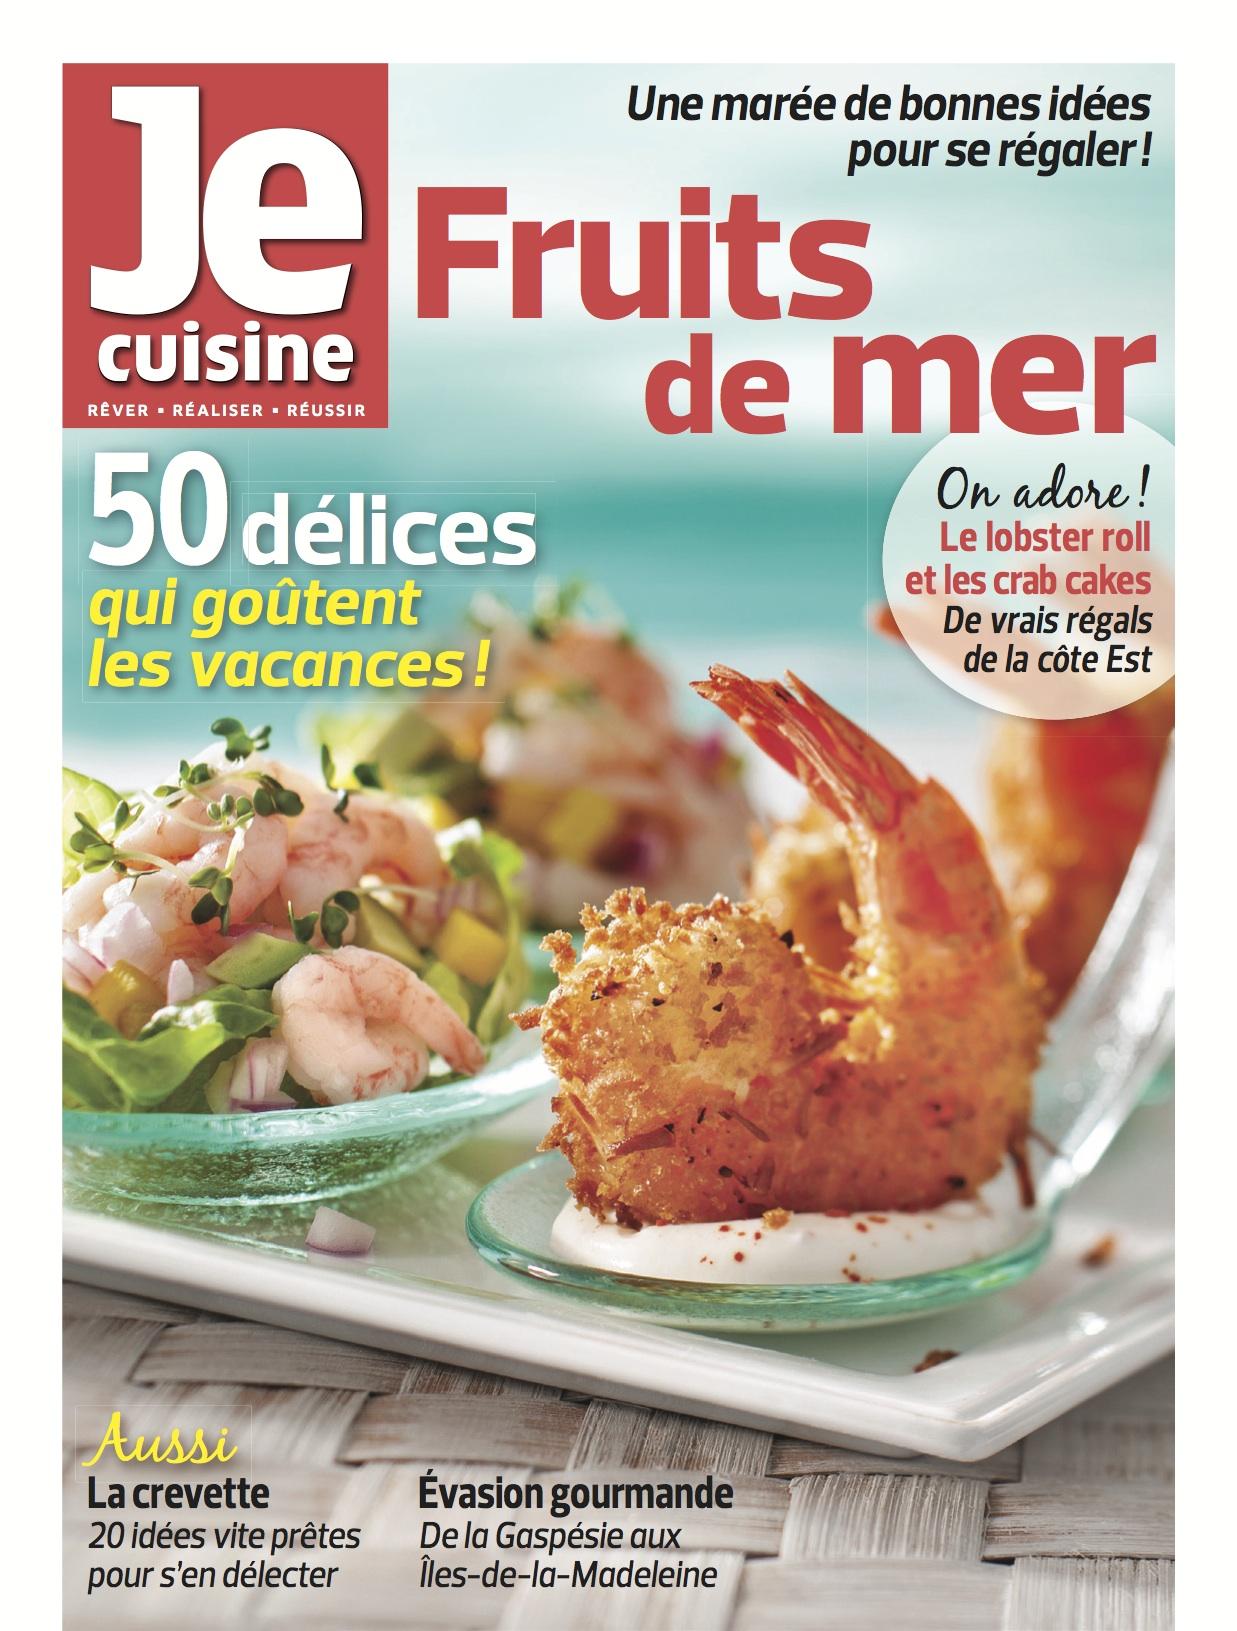 Je Cuisine Fruits de mer